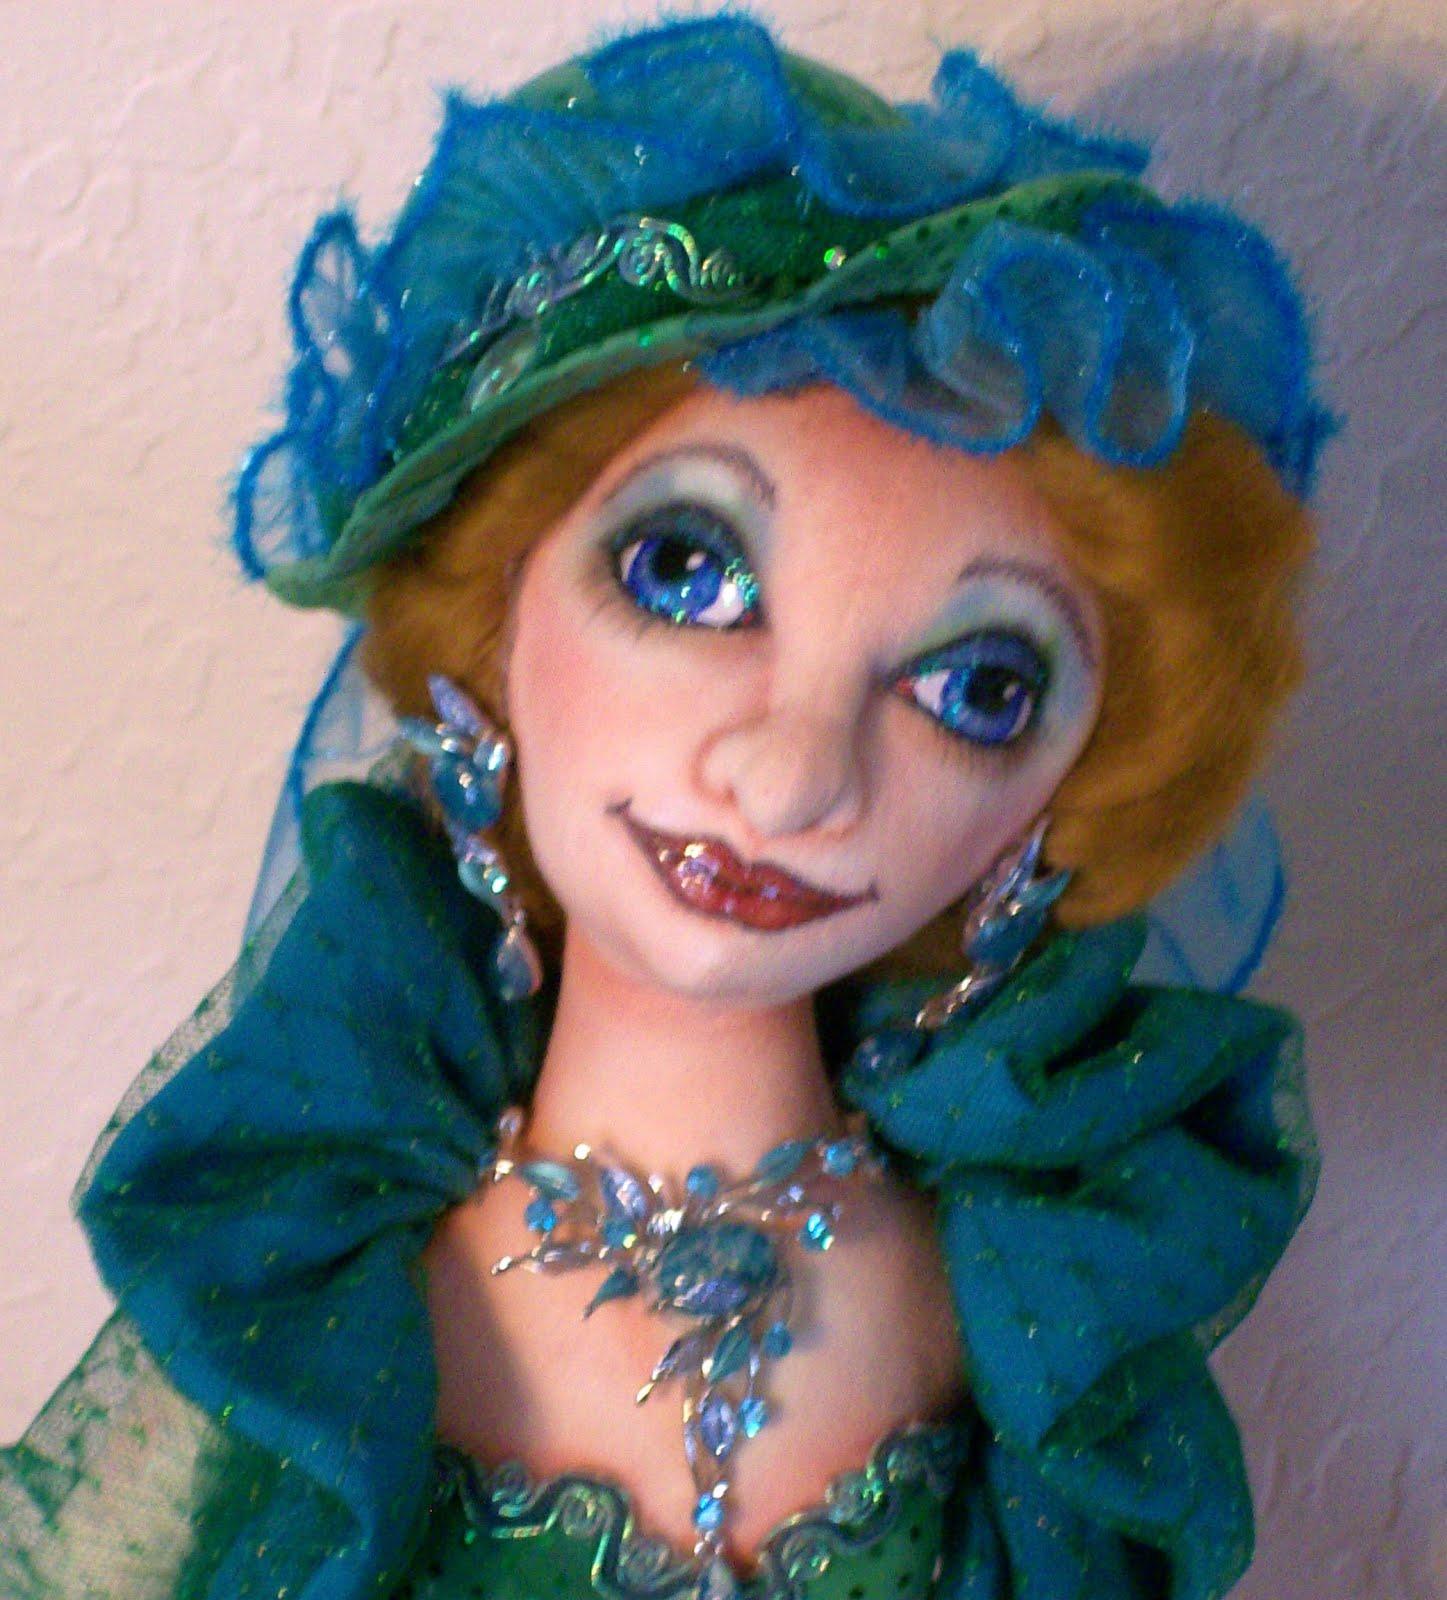 The doll I call JILL